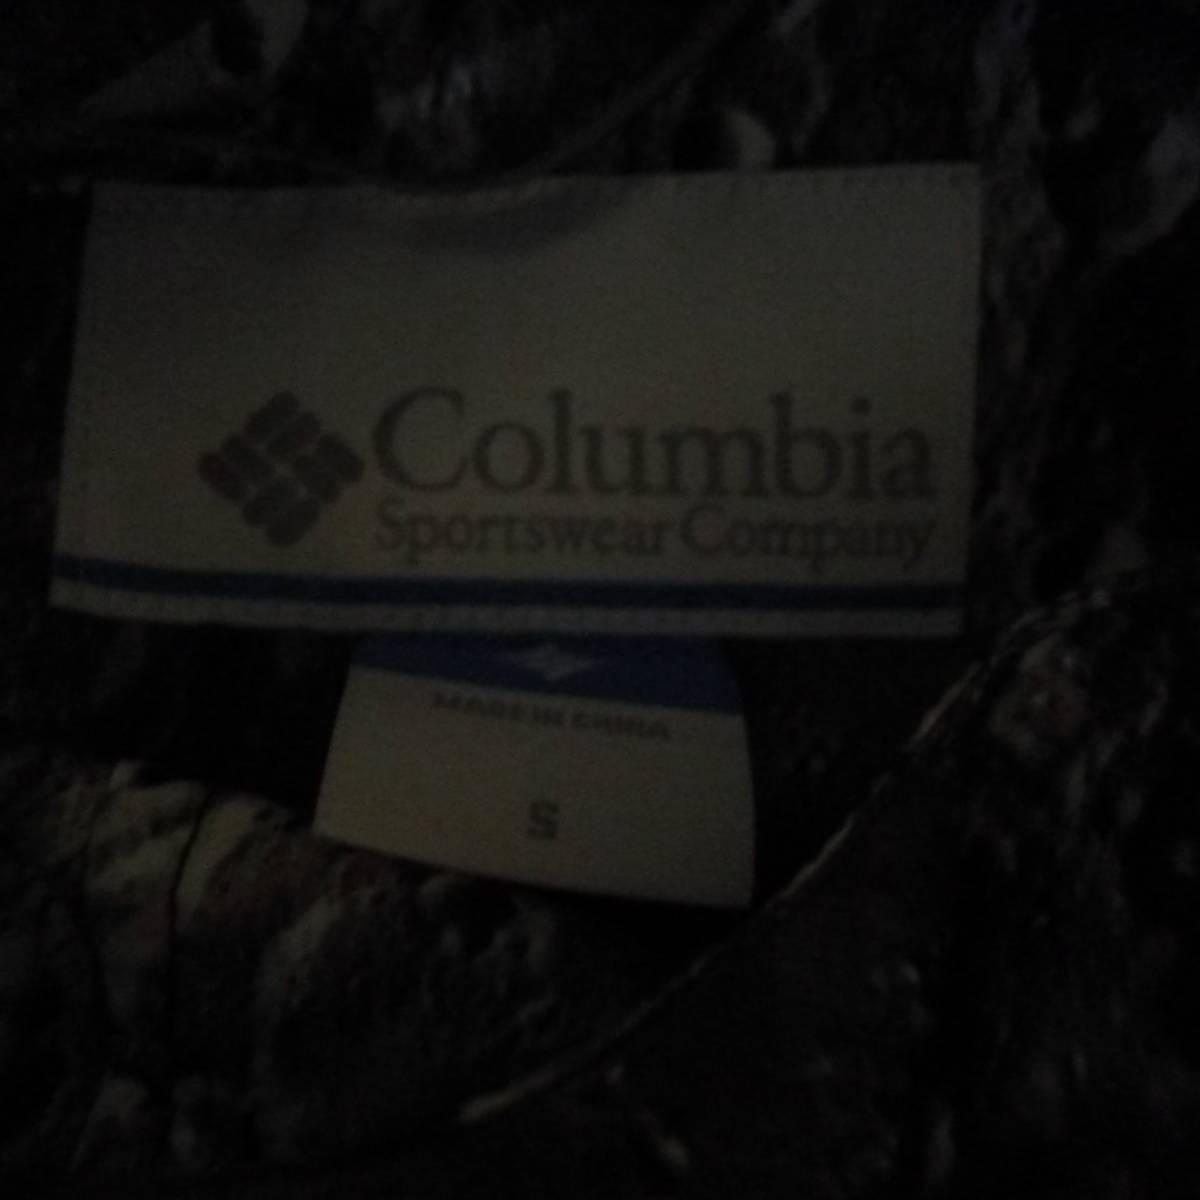 Kinetics × Columbia Tyger SweepTM Jacket タイガースウィープジャケット 月面柄 キネティックス コラボ_画像6